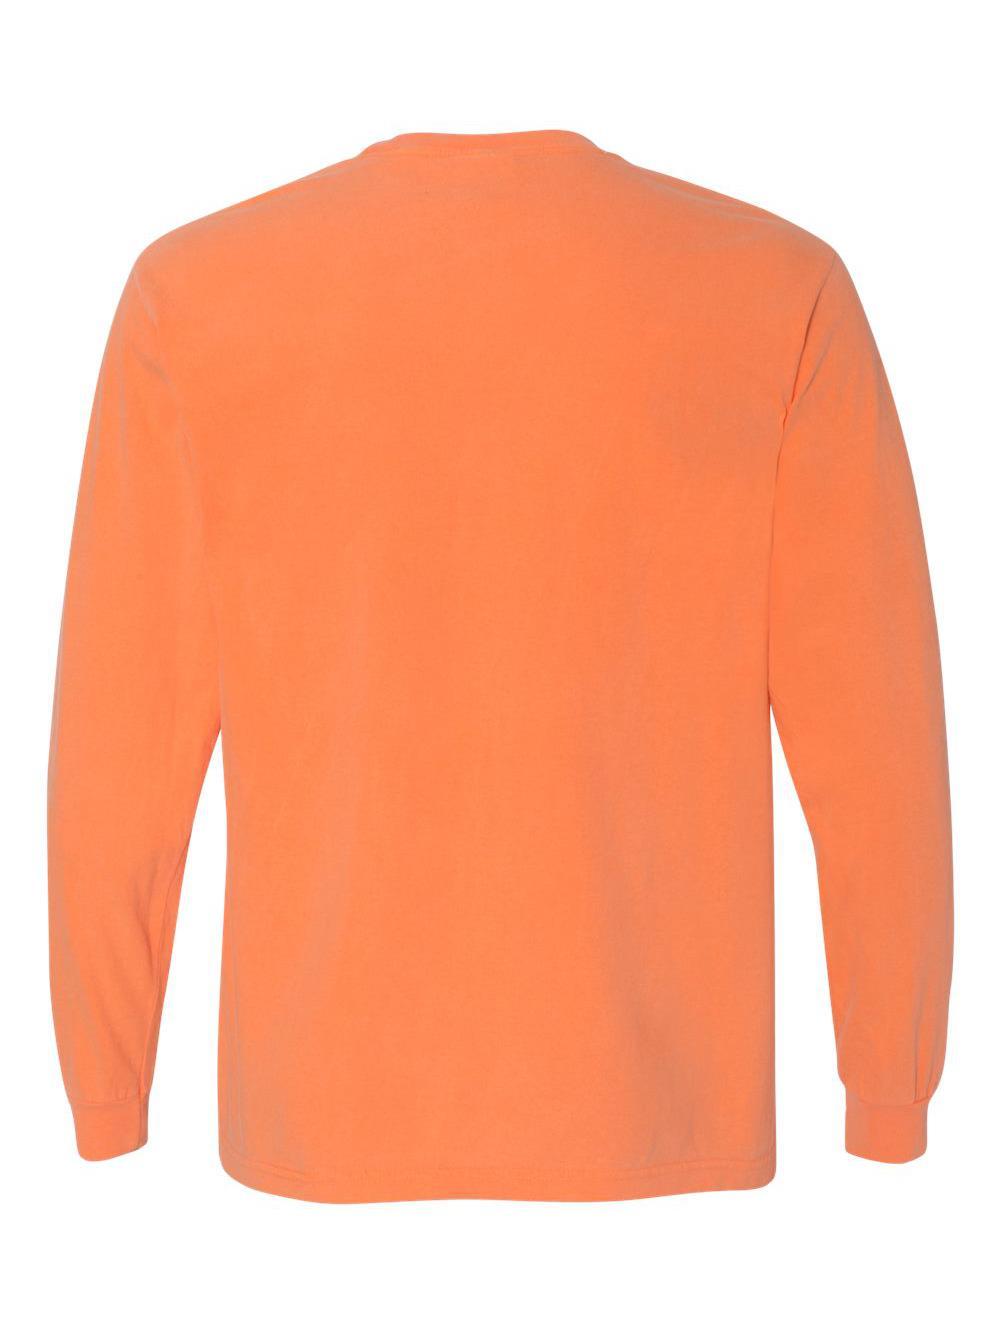 Comfort-Colors-Garment-Dyed-Heavyweight-Ringspun-Long-Sleeve-T-Shirt-6014 thumbnail 49